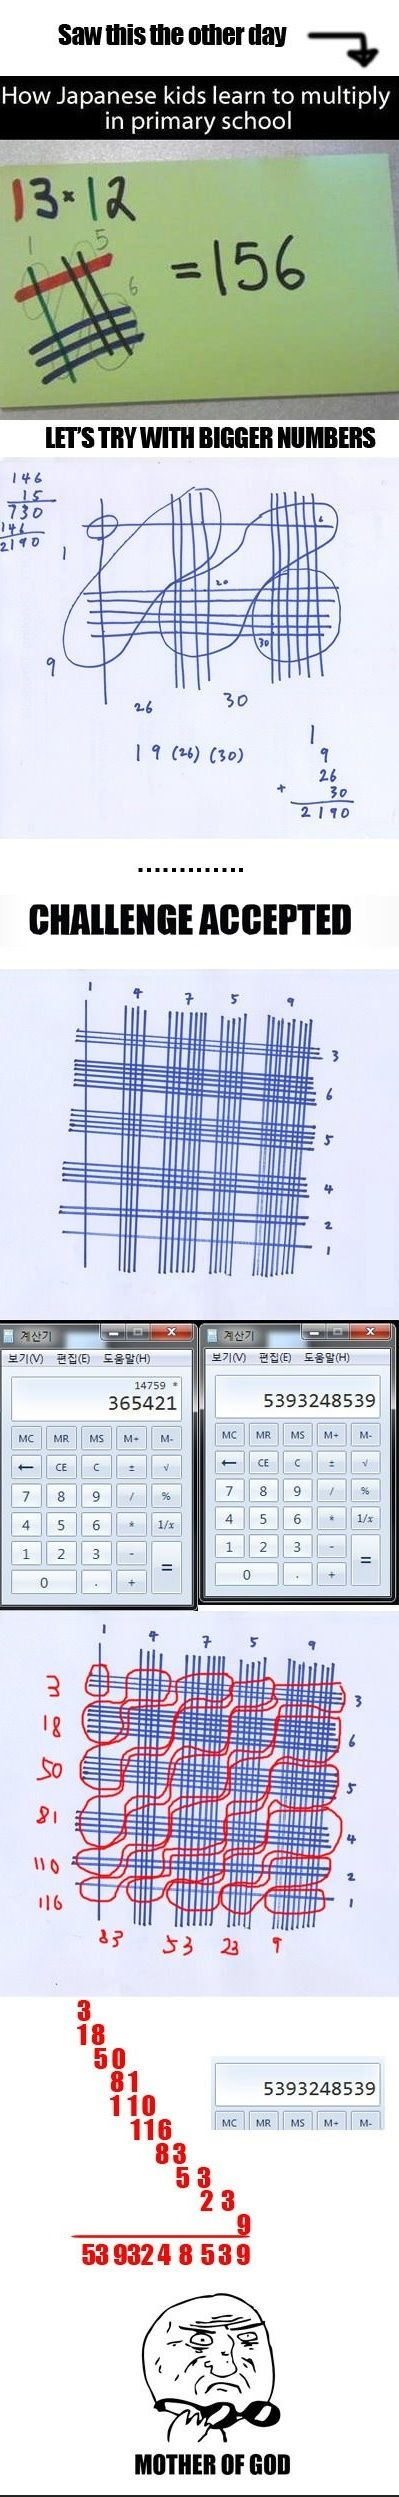 How Japanese School Children Learn to Multiply? | TutorZ.com